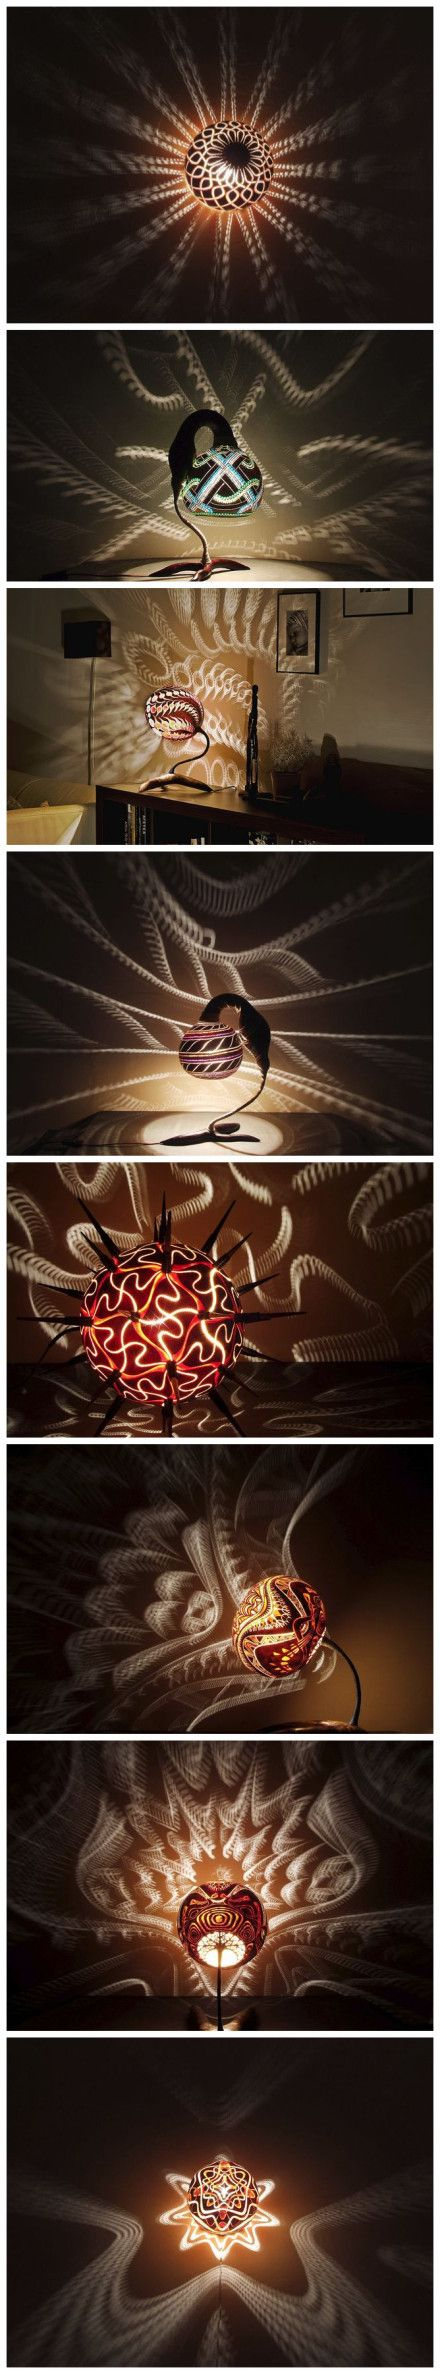 gourd lamp: